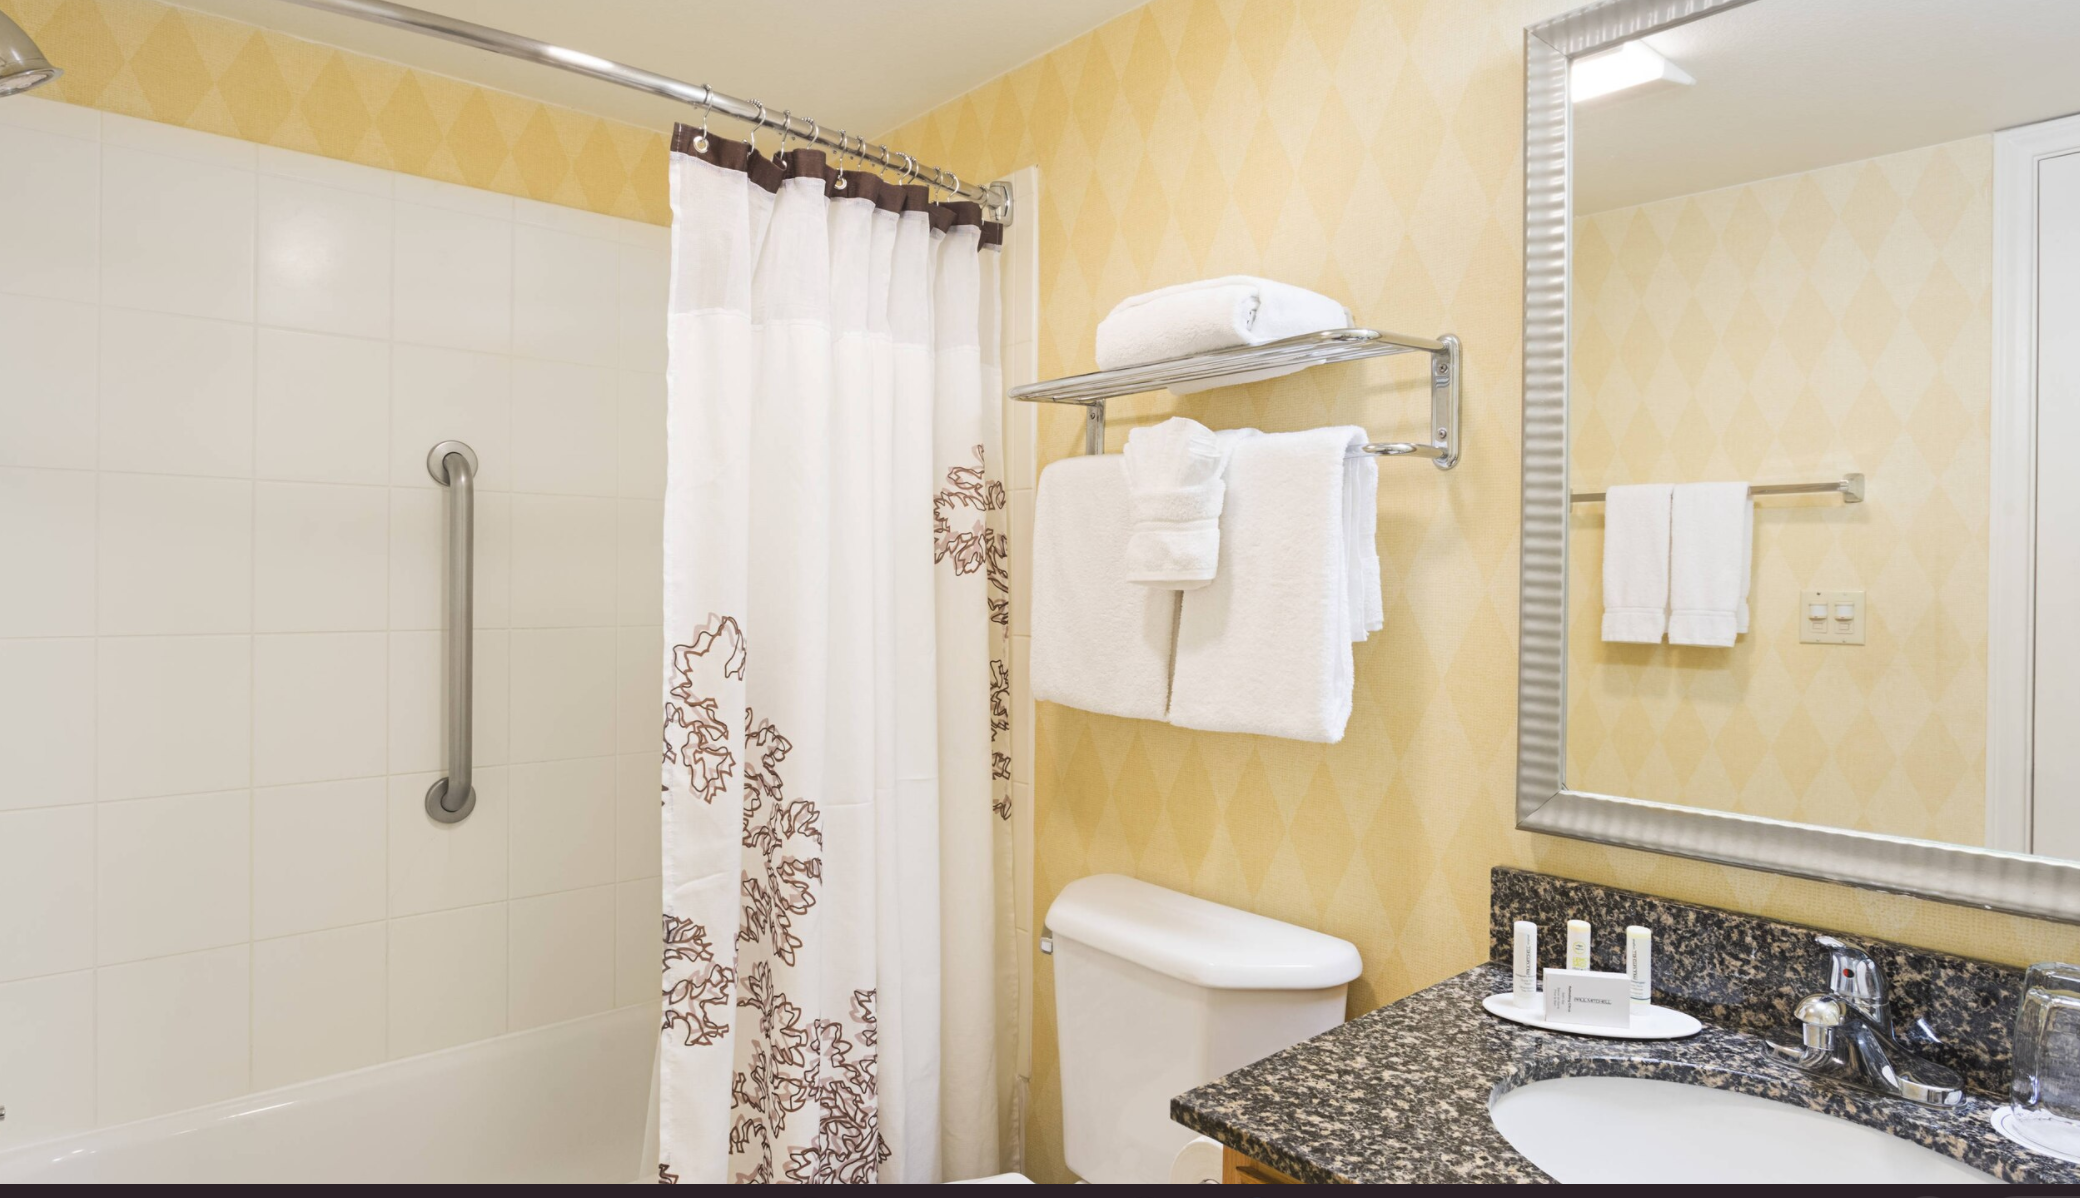 https://www.hotelsbyday.com/_data/default-hotel_image/4/21080/screenshot-2020-08-19-at-6-50-11-pm.png